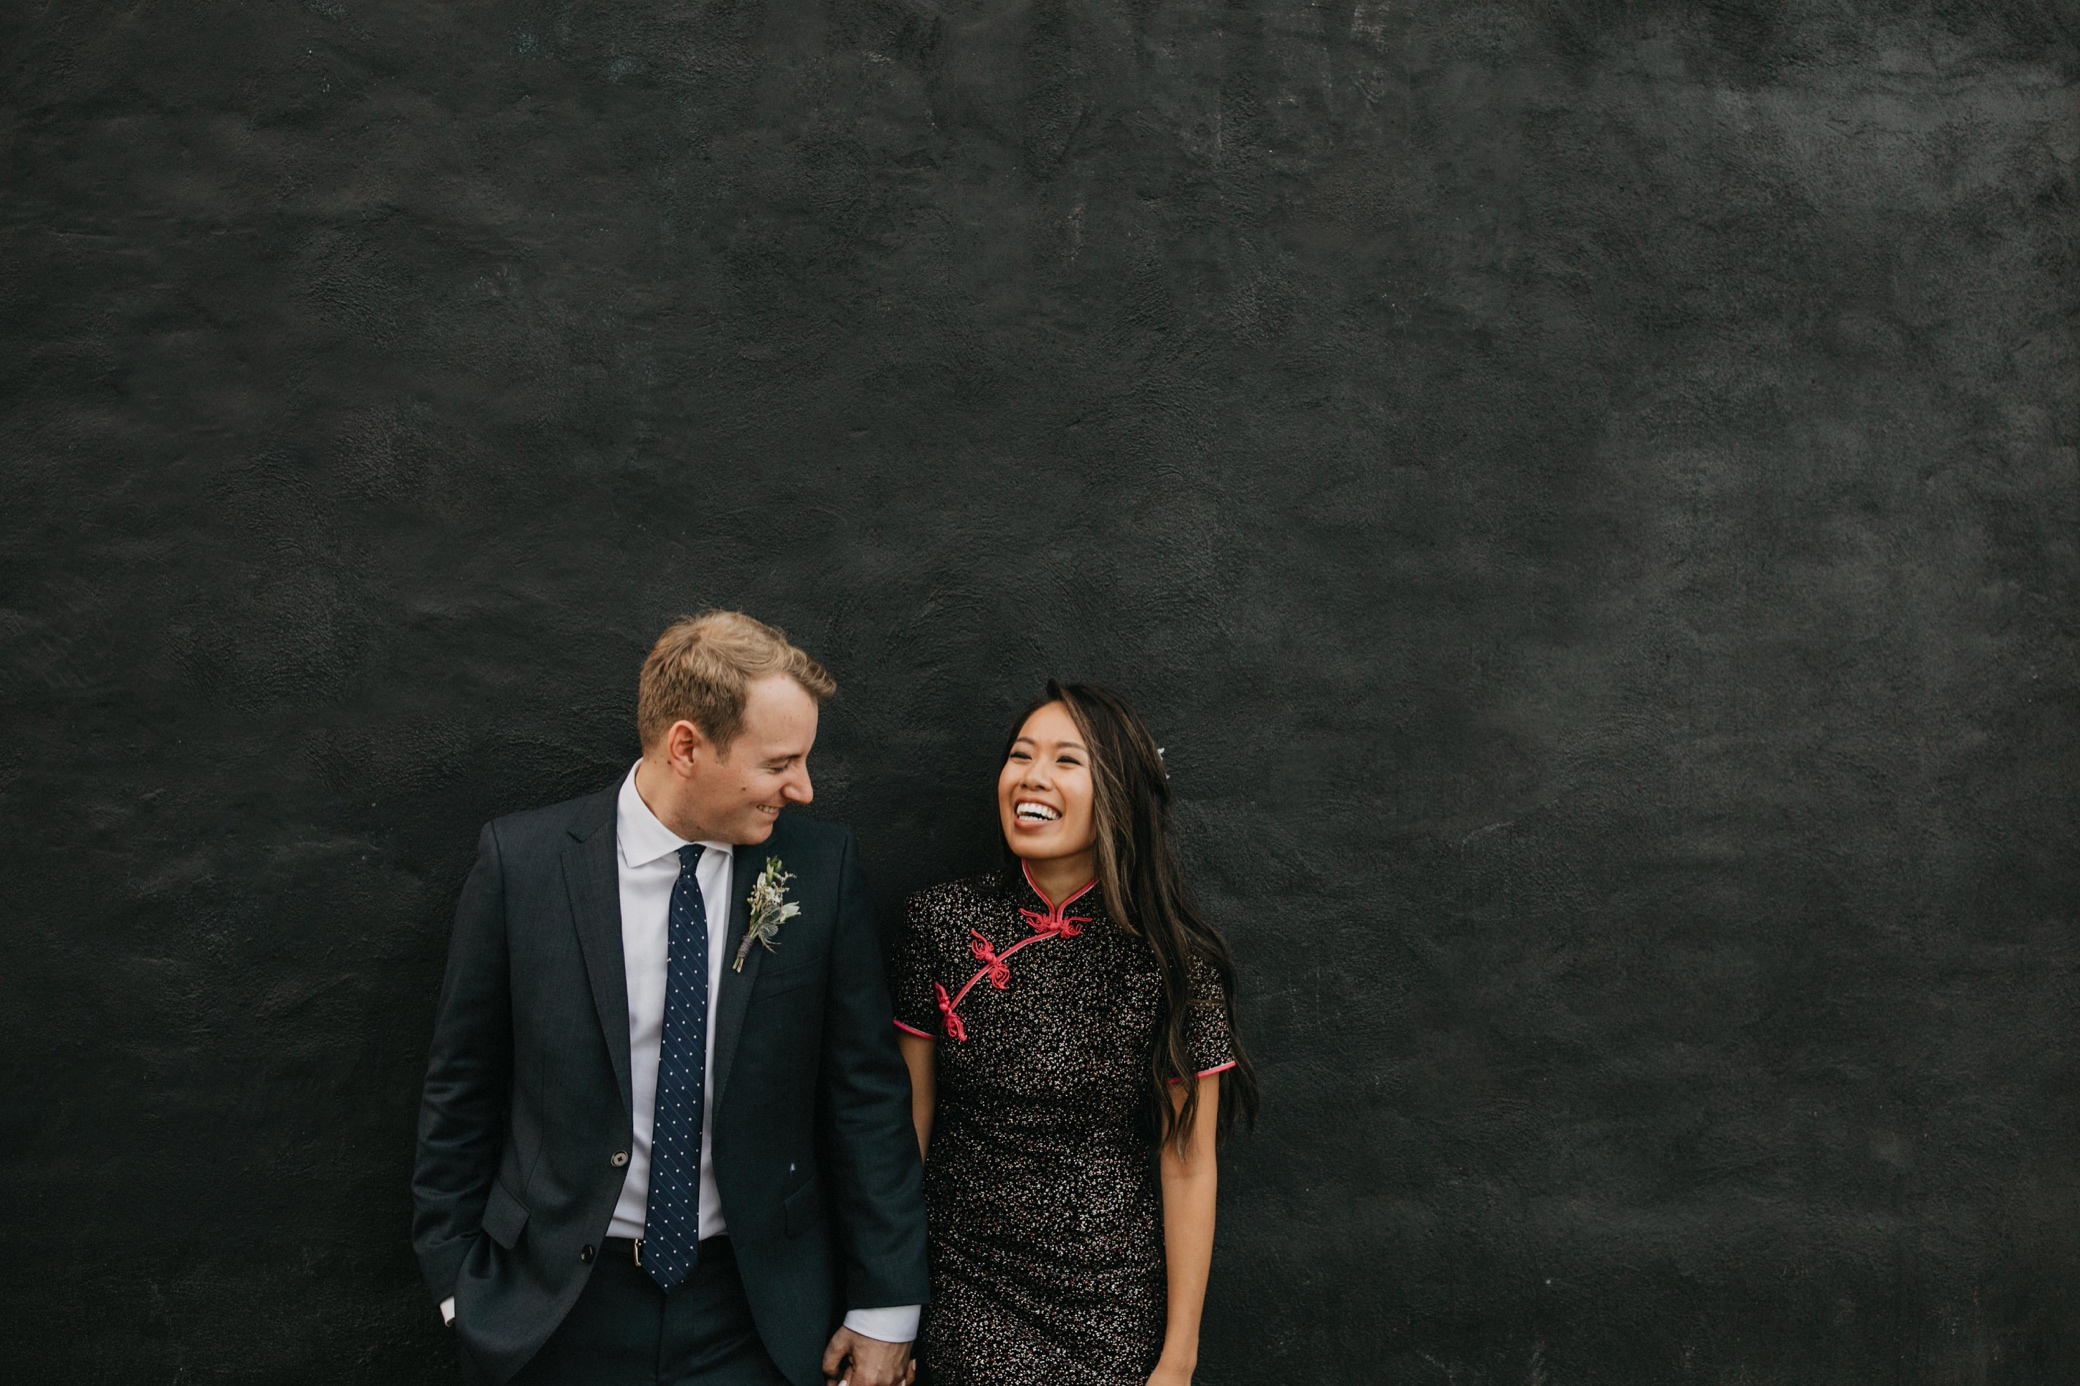 109_The Broadview Hotel Wedding (675 of 913).jpg